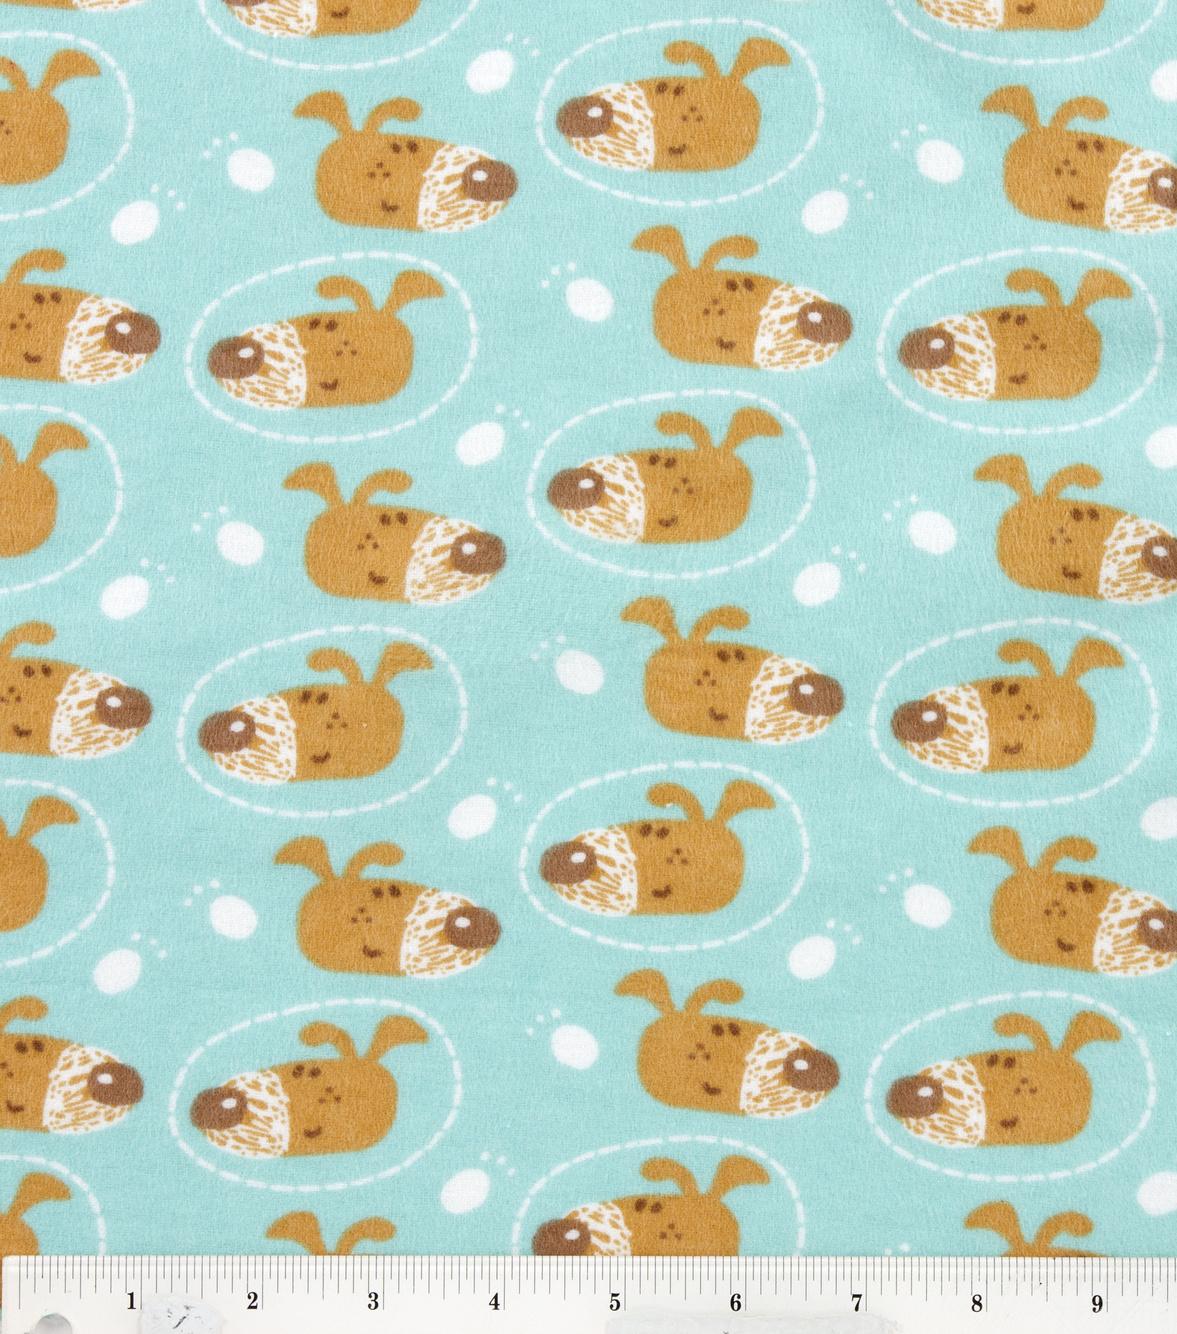 Snuggle Flannel Fabric- Dog Face